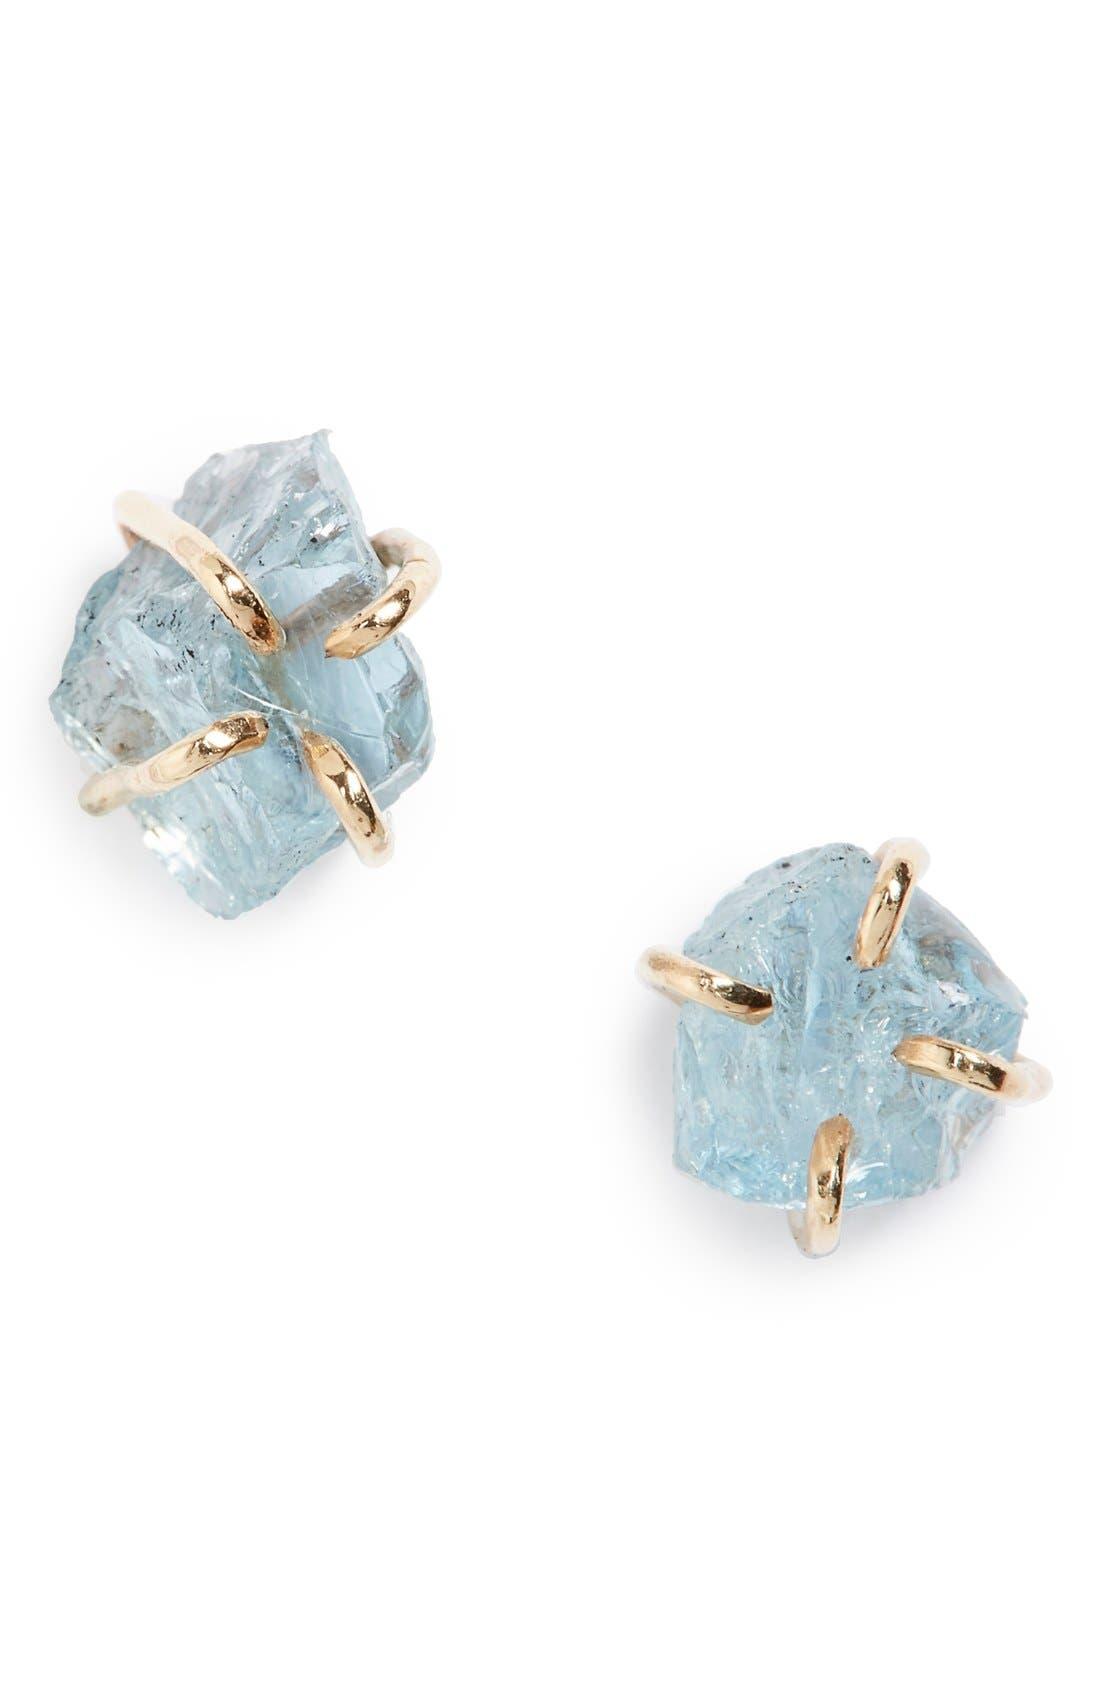 Main Image - Melissa Joy Manning Raw Aquamarine Stone Stud Earrings